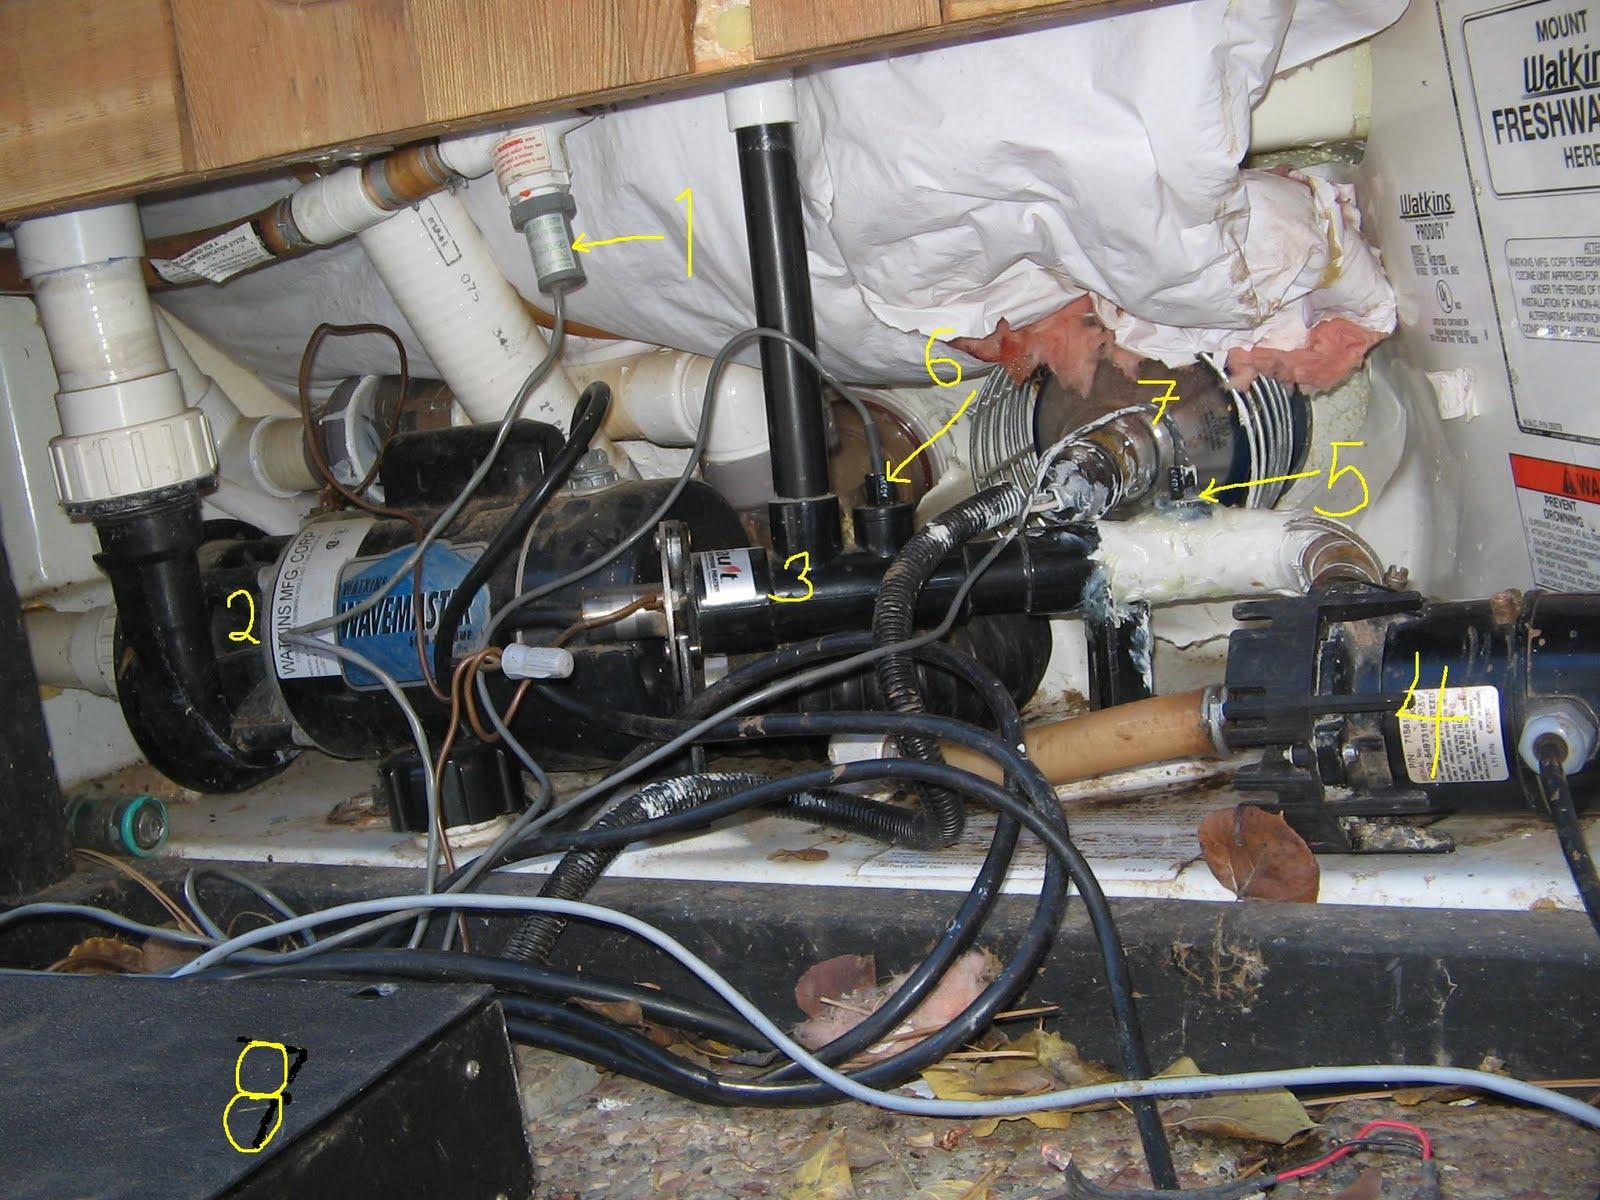 Hot Spring Spa Control Parts